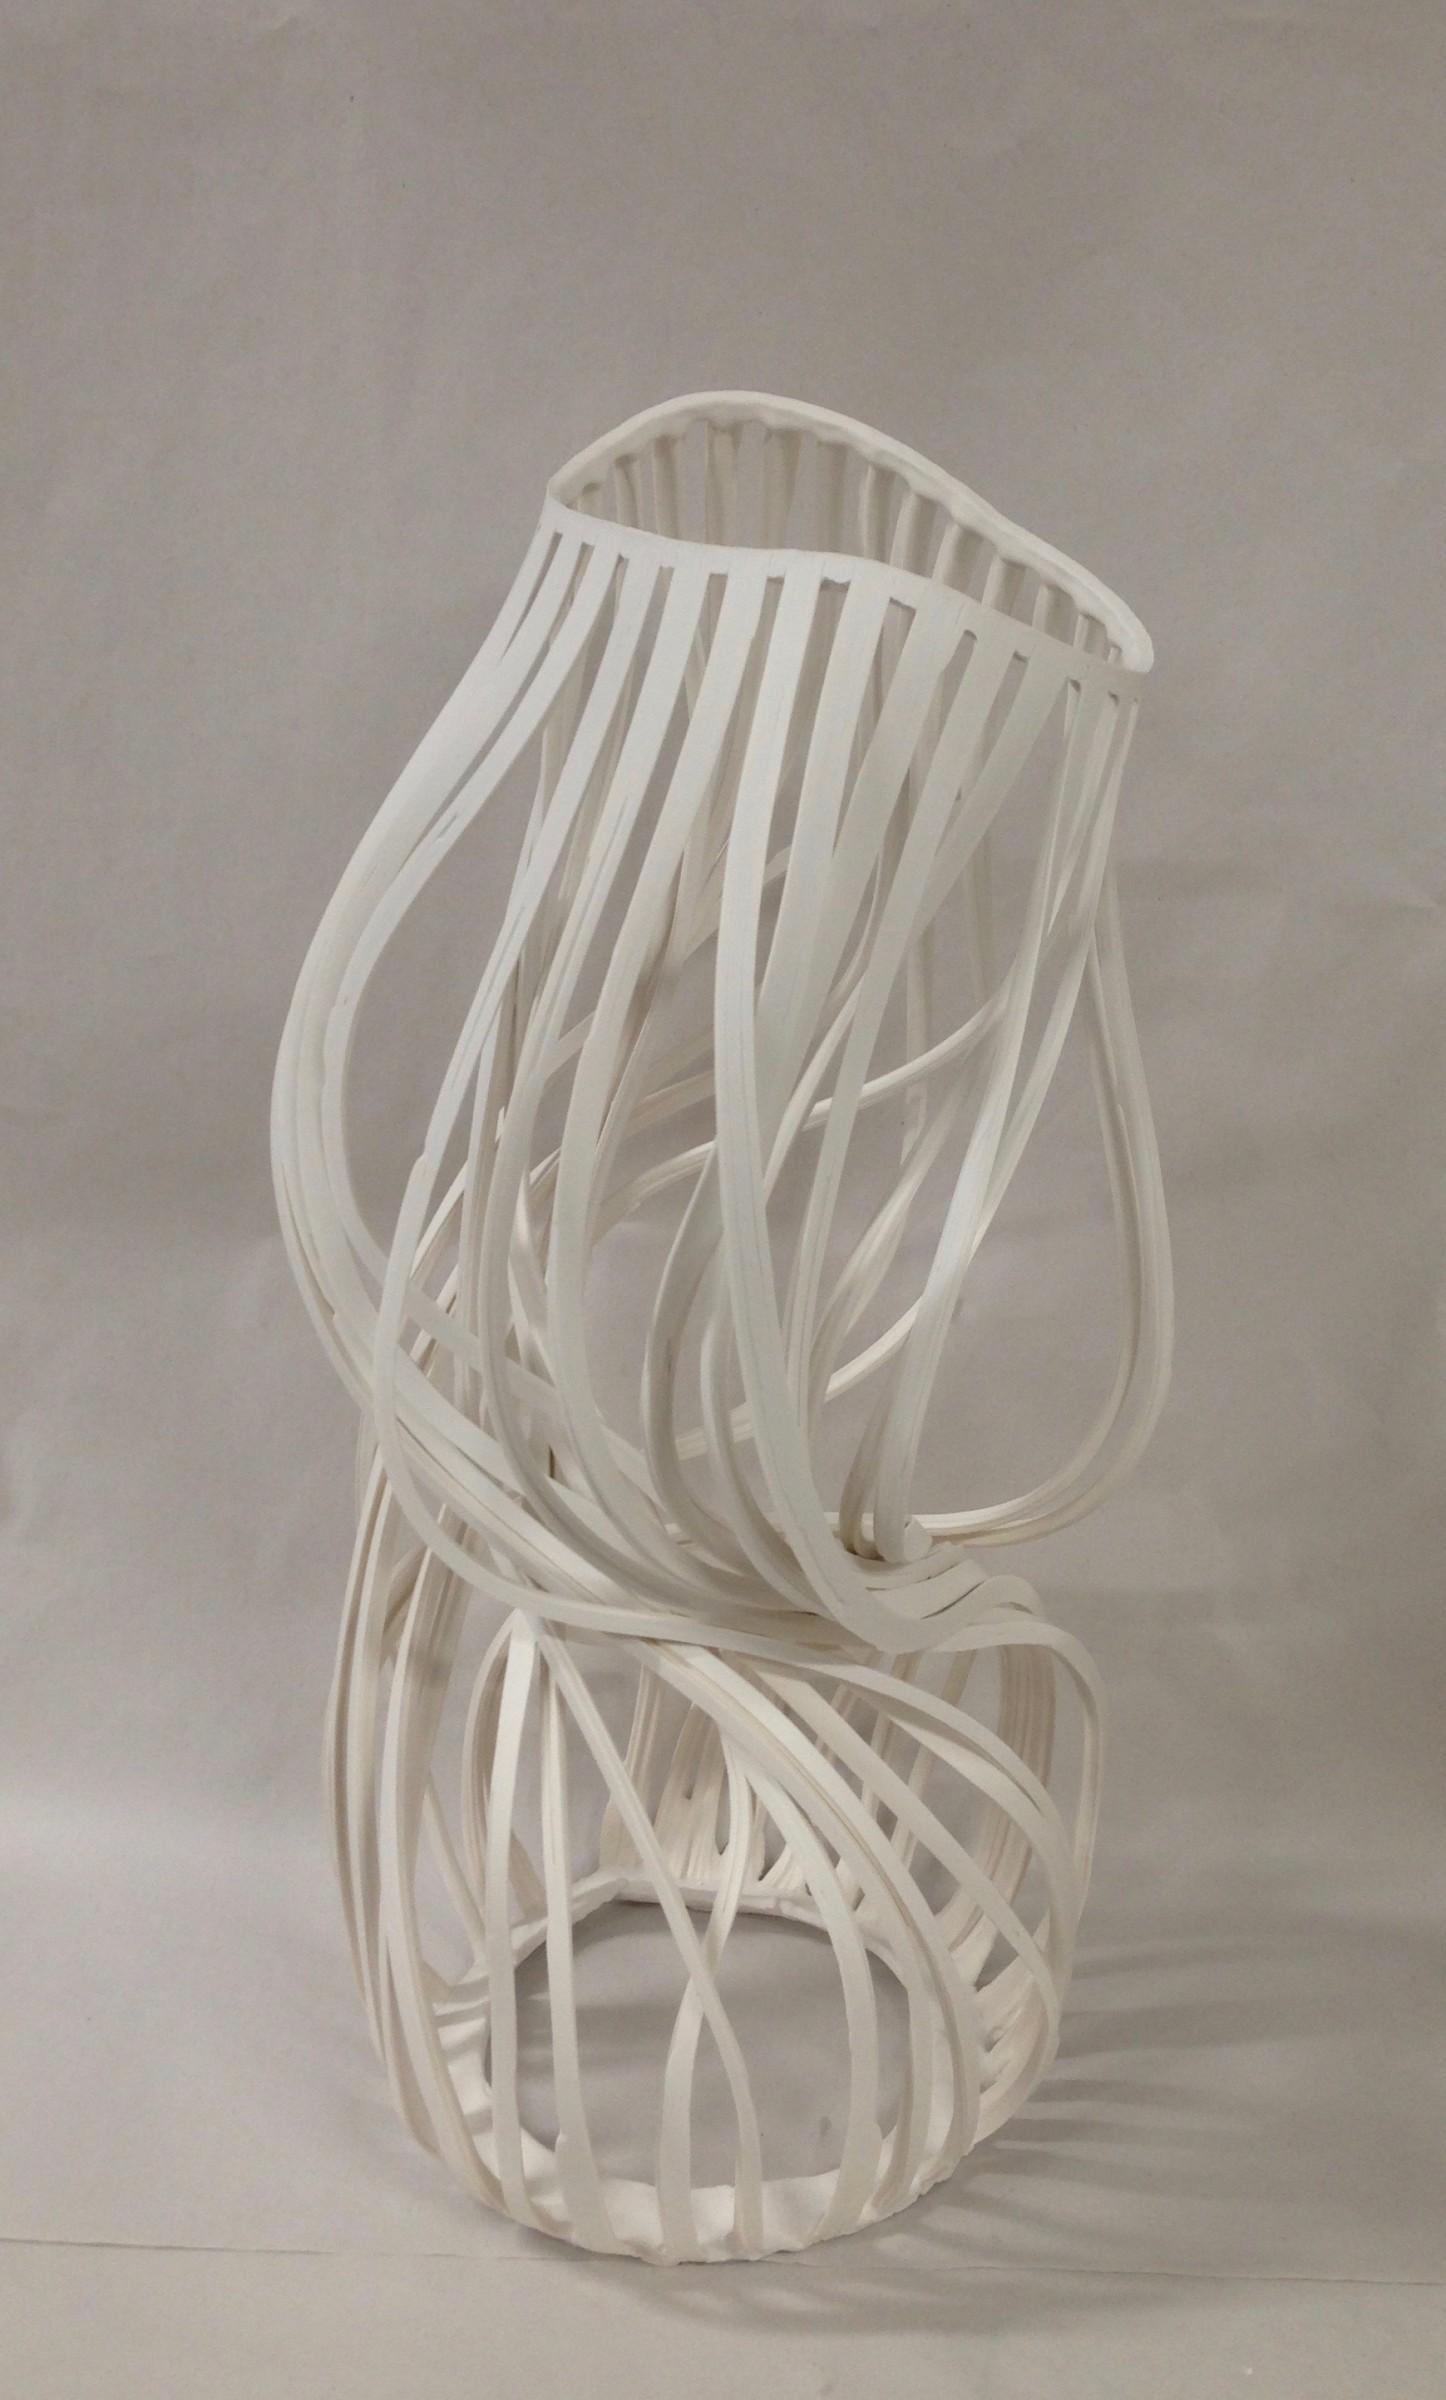 "<span class=""link fancybox-details-link""><a href=""/exhibitions/9/works/artworks2179/"">View Detail Page</a></span><div class=""artist""><strong>Lauren Nauman</strong></div><div class=""title""><em>Lines, 48 White</em>, 2018</div><div class=""medium"">Porcelain</div><div class=""dimensions"">48 x 25 x 23 cm<br>18 7/8 x 9 7/8 x 9 1/8 in.</div>"